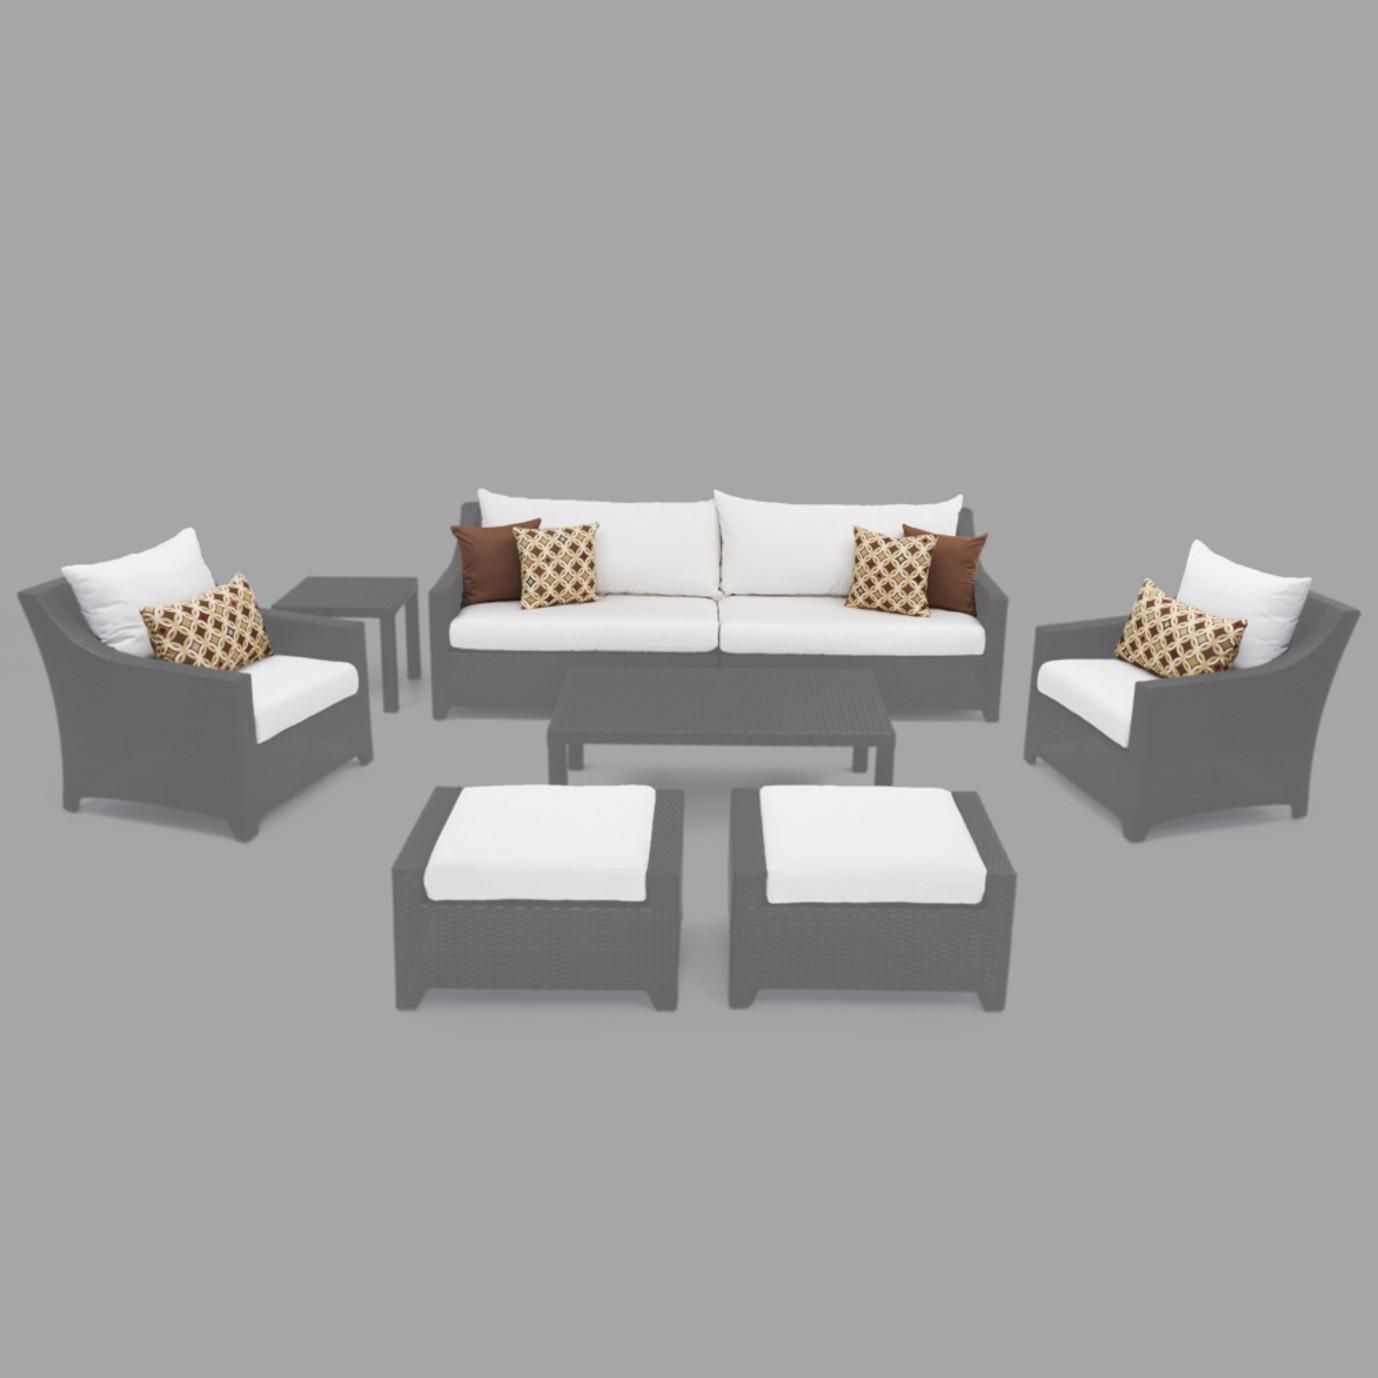 Modular Outdoor 8pc Club Cushion Cover Set - Moroccan Cream